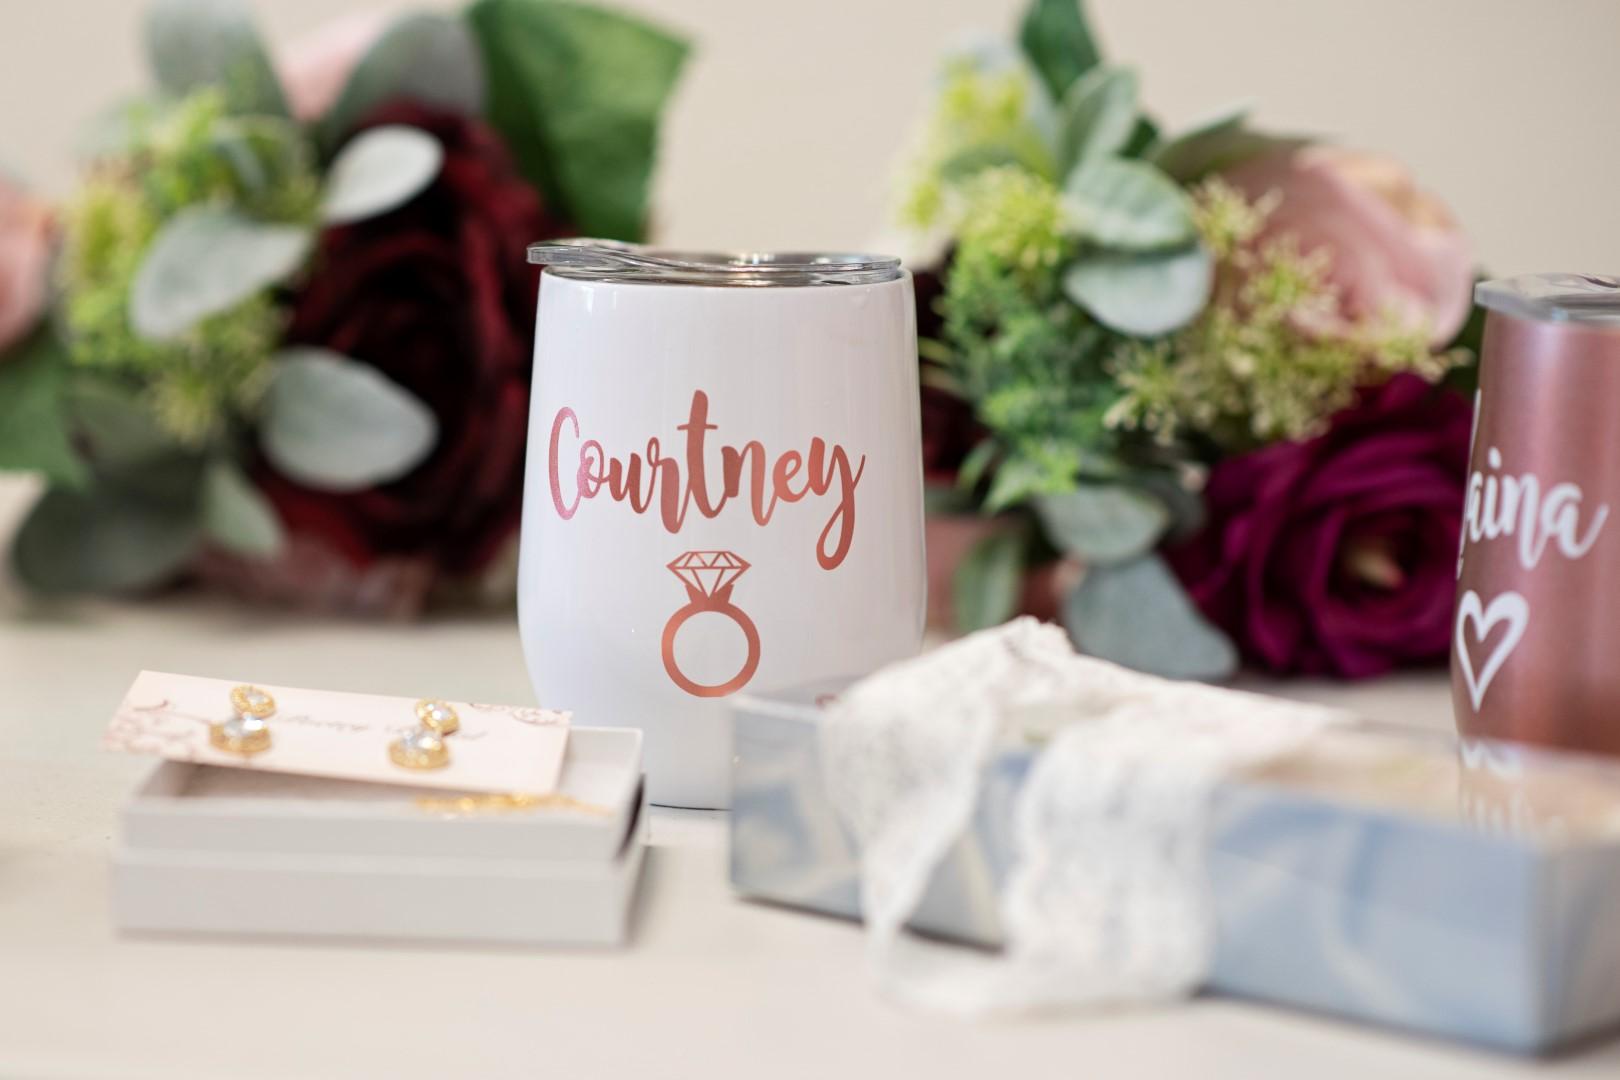 Courtney & Matt Dairy Barn Wedding May 2019_03 (Large).jpg